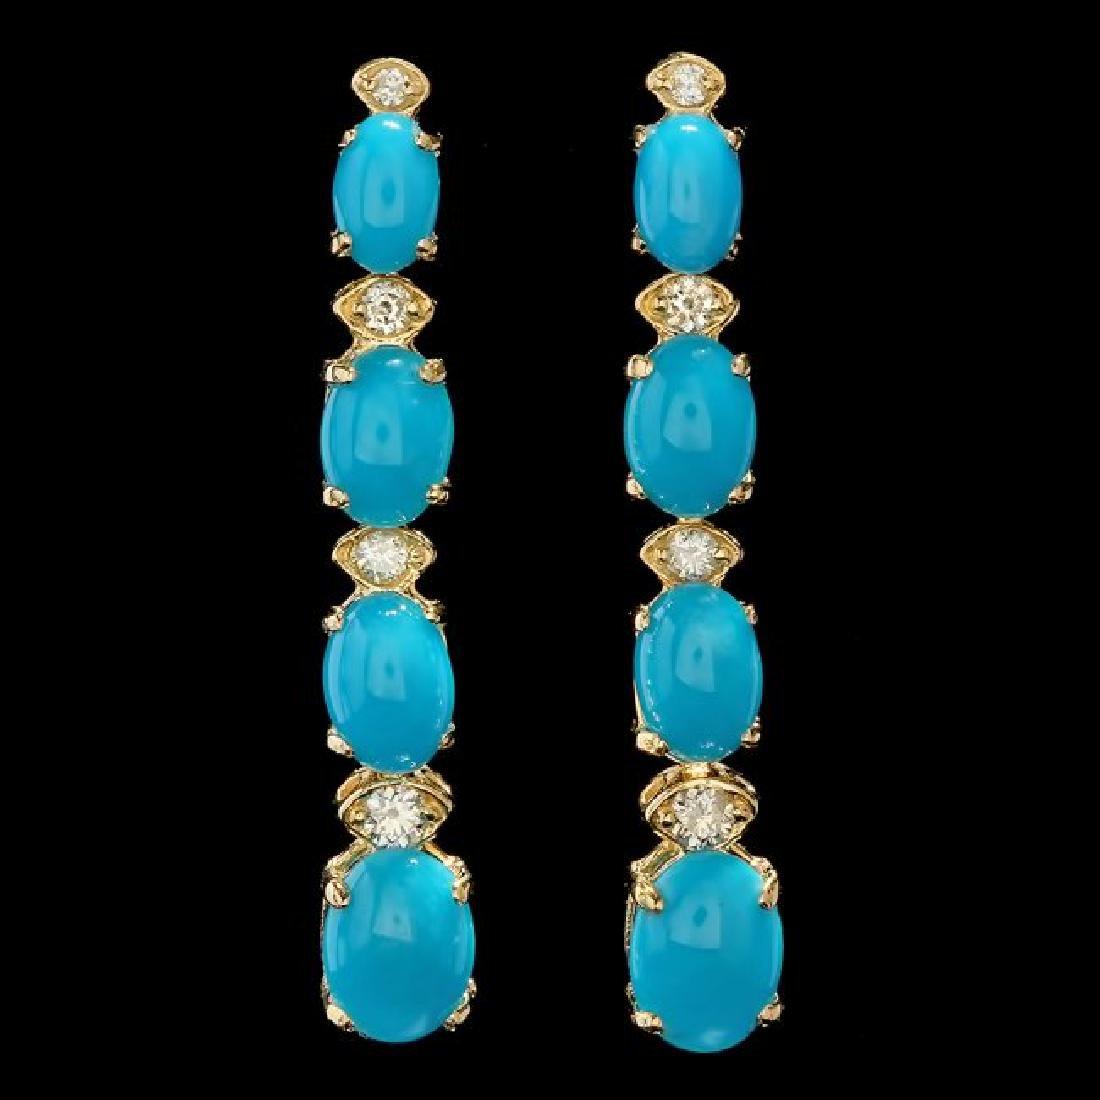 14k Gold 5.50ct Turquoise 0.35ct Diamond Earrings